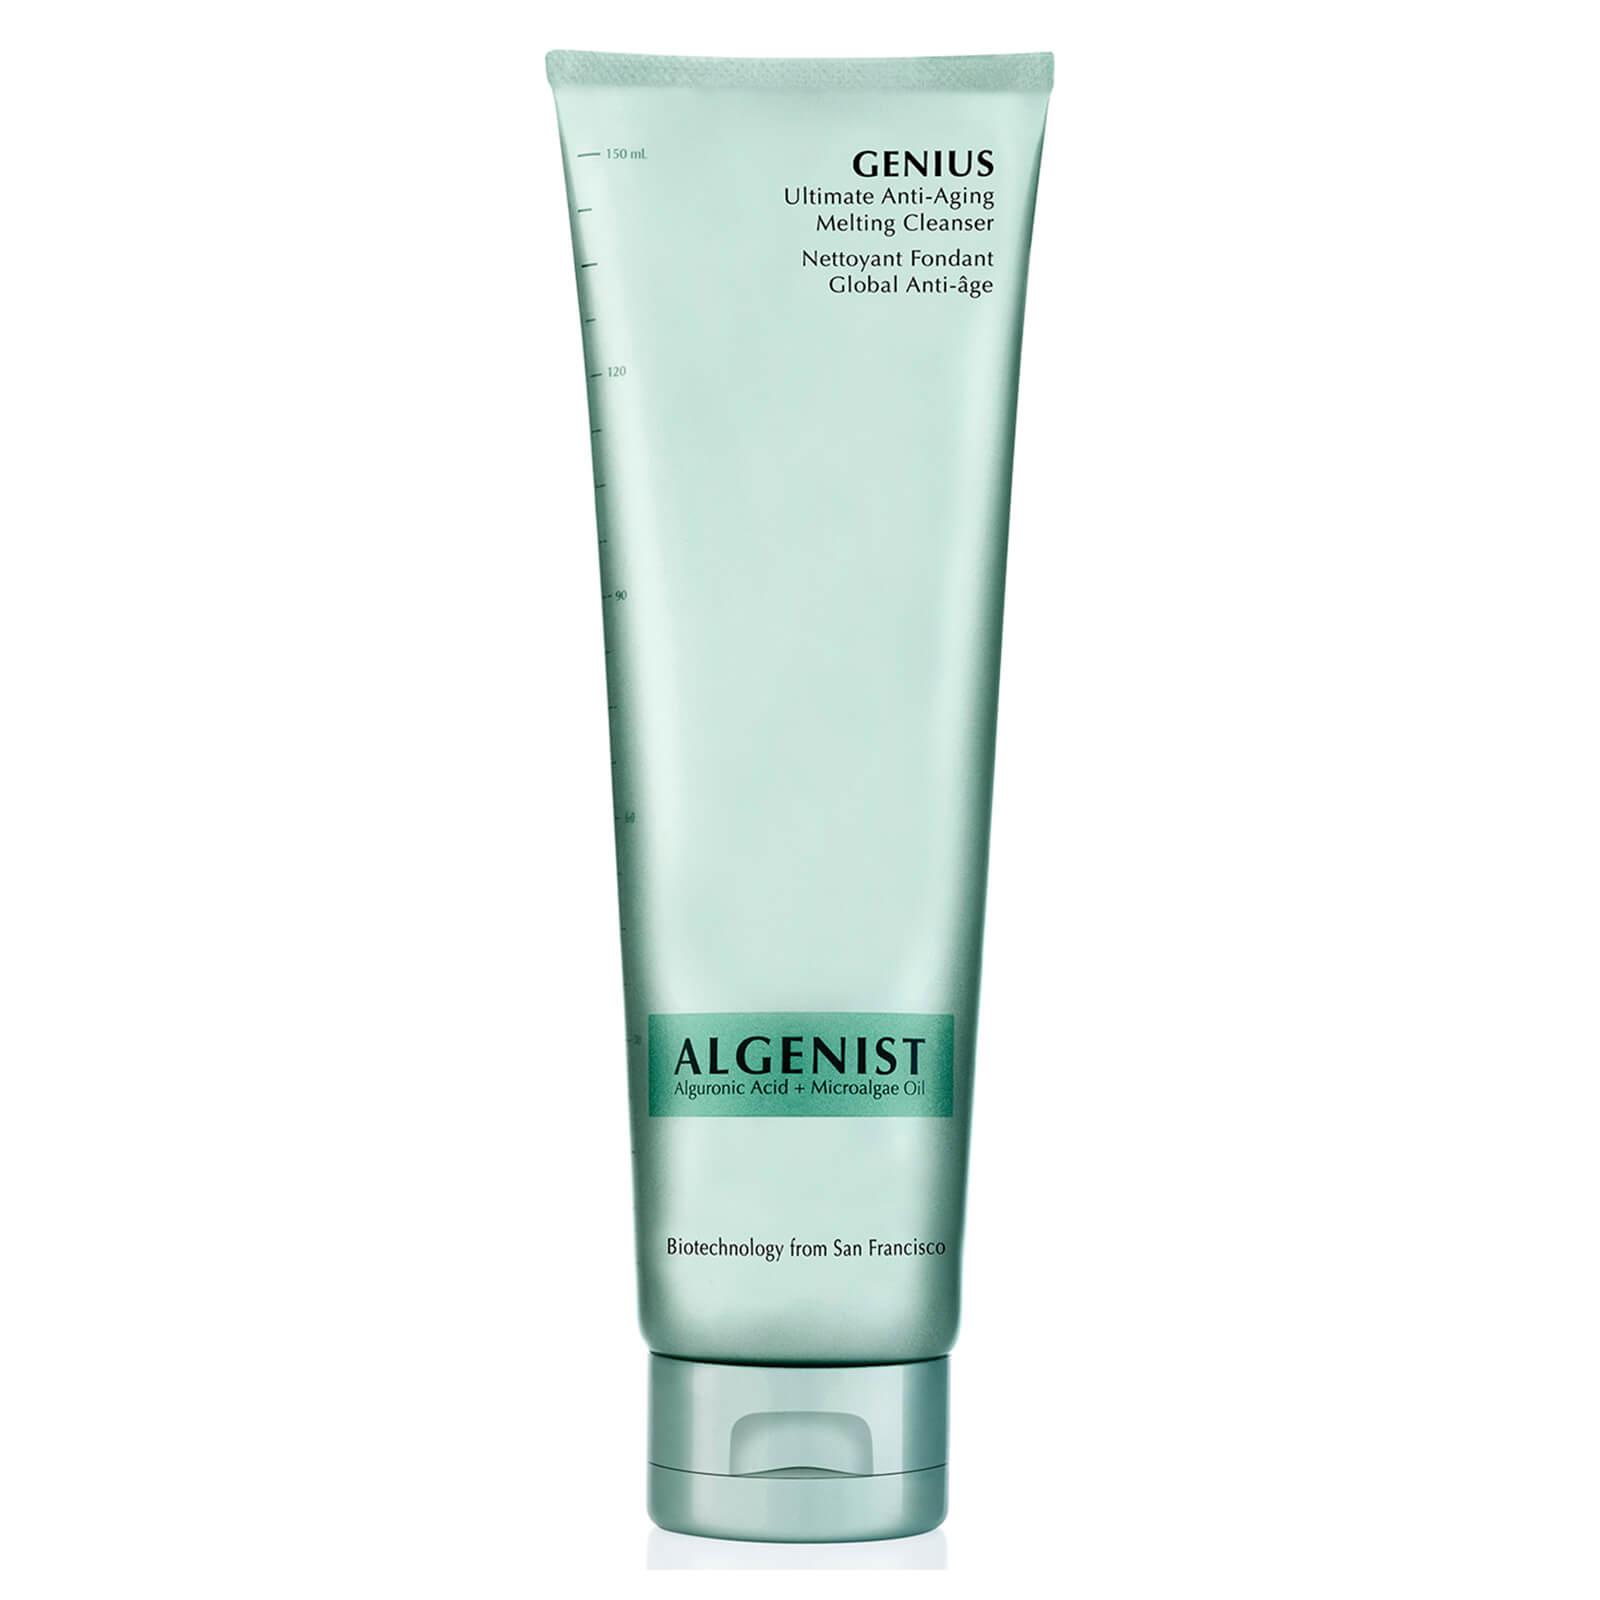 algenist genius ultimate anti-ageing melting cleanser 150ml